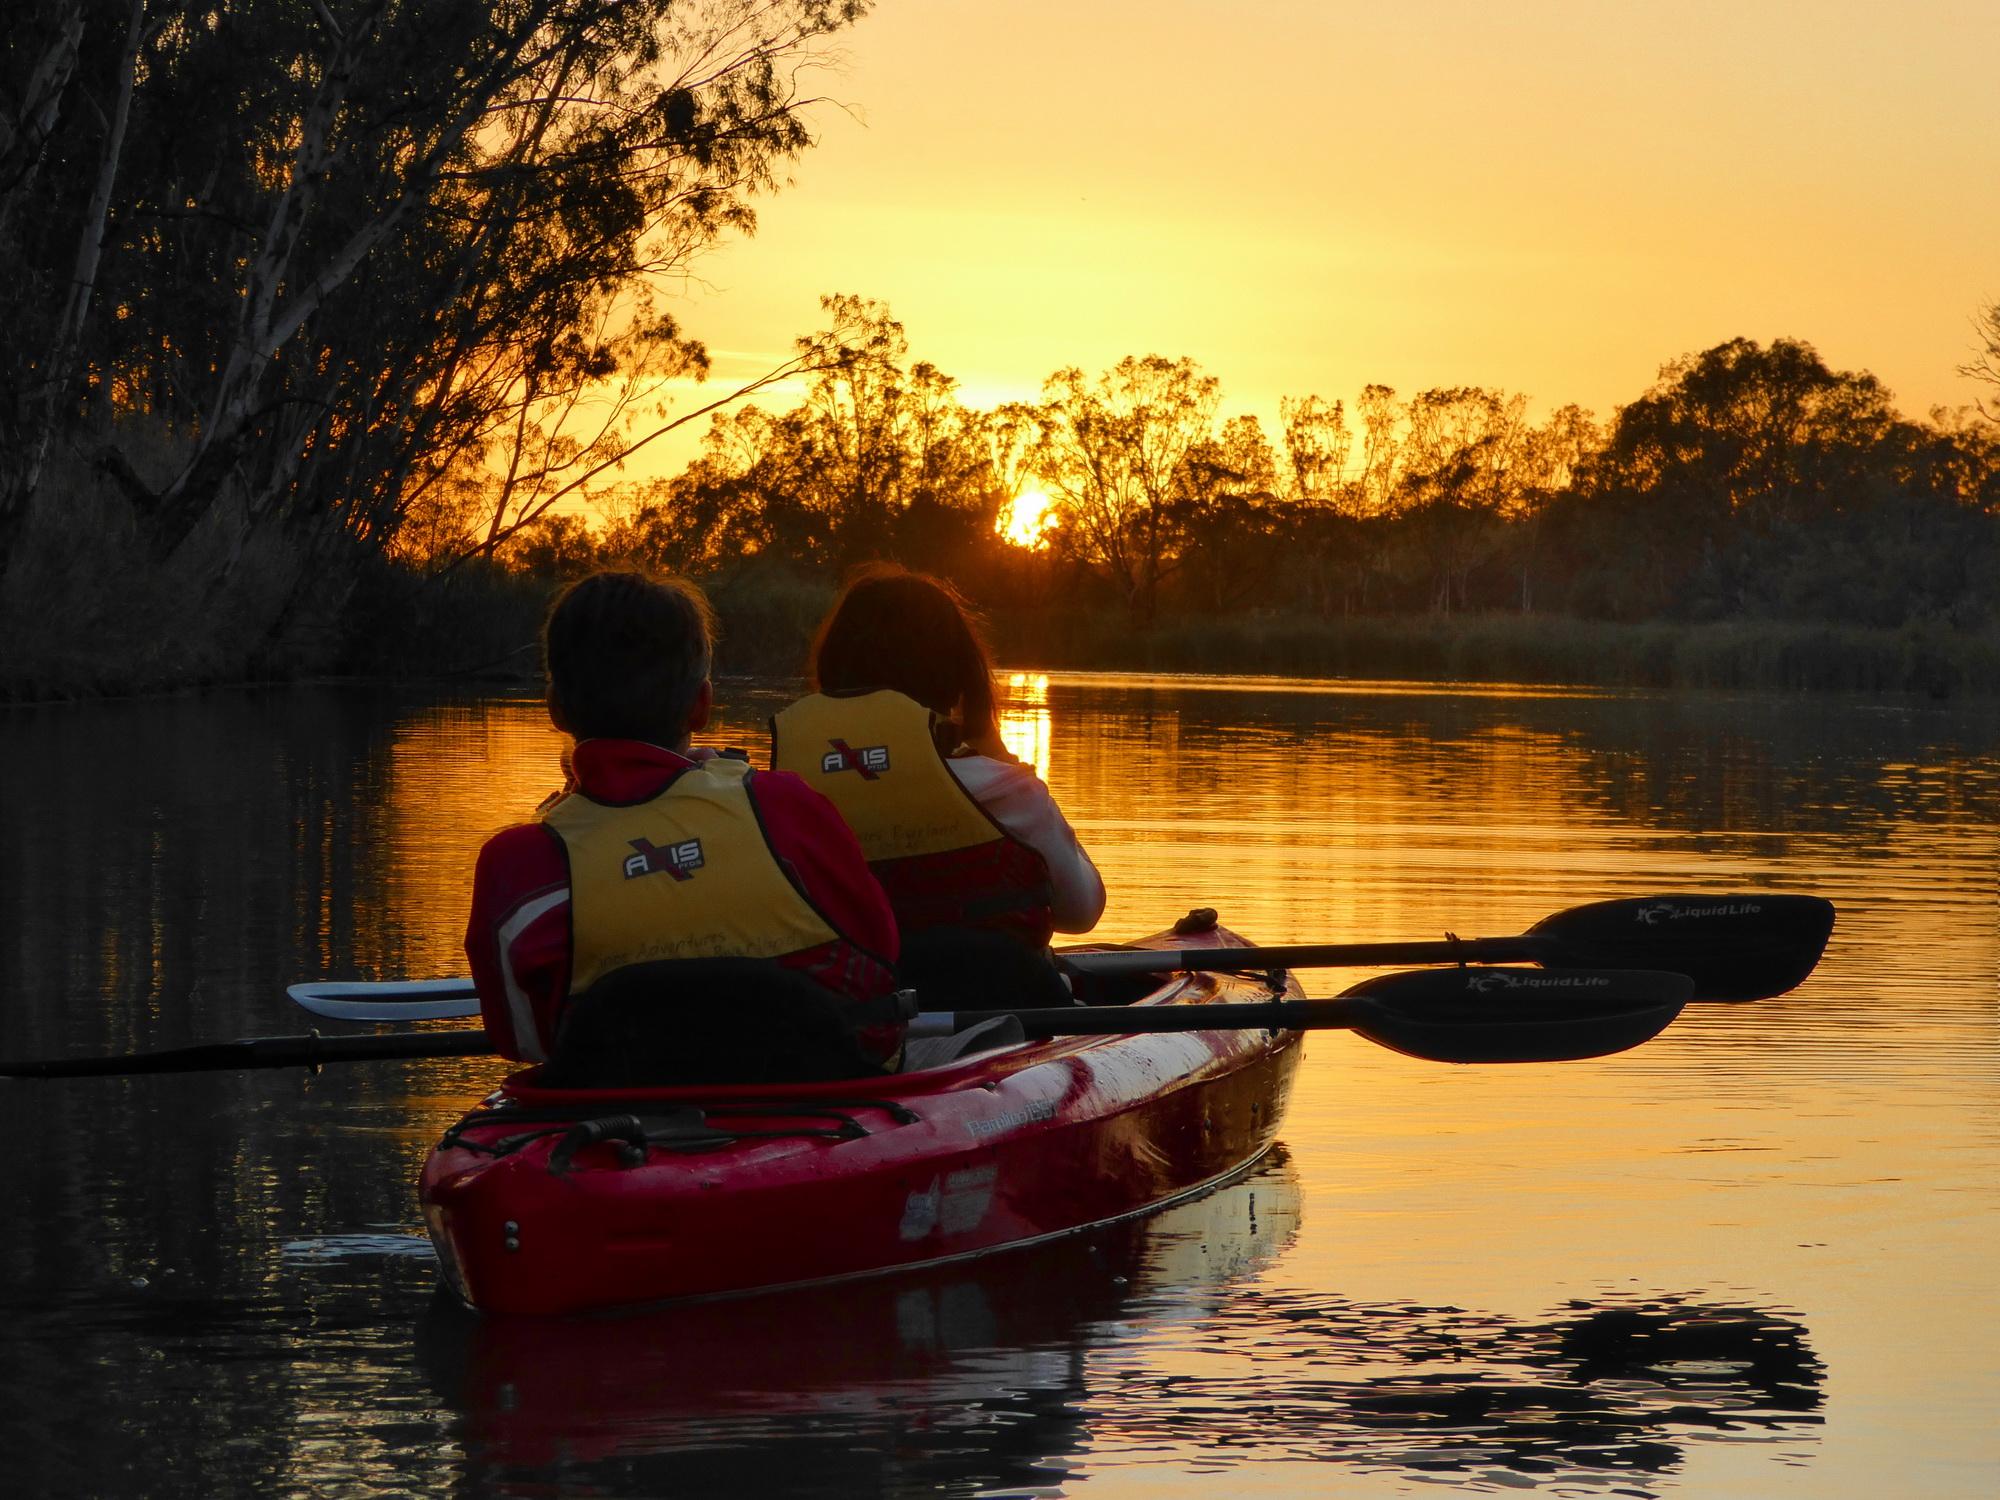 Kayakers enjoying a beautiful sunset.